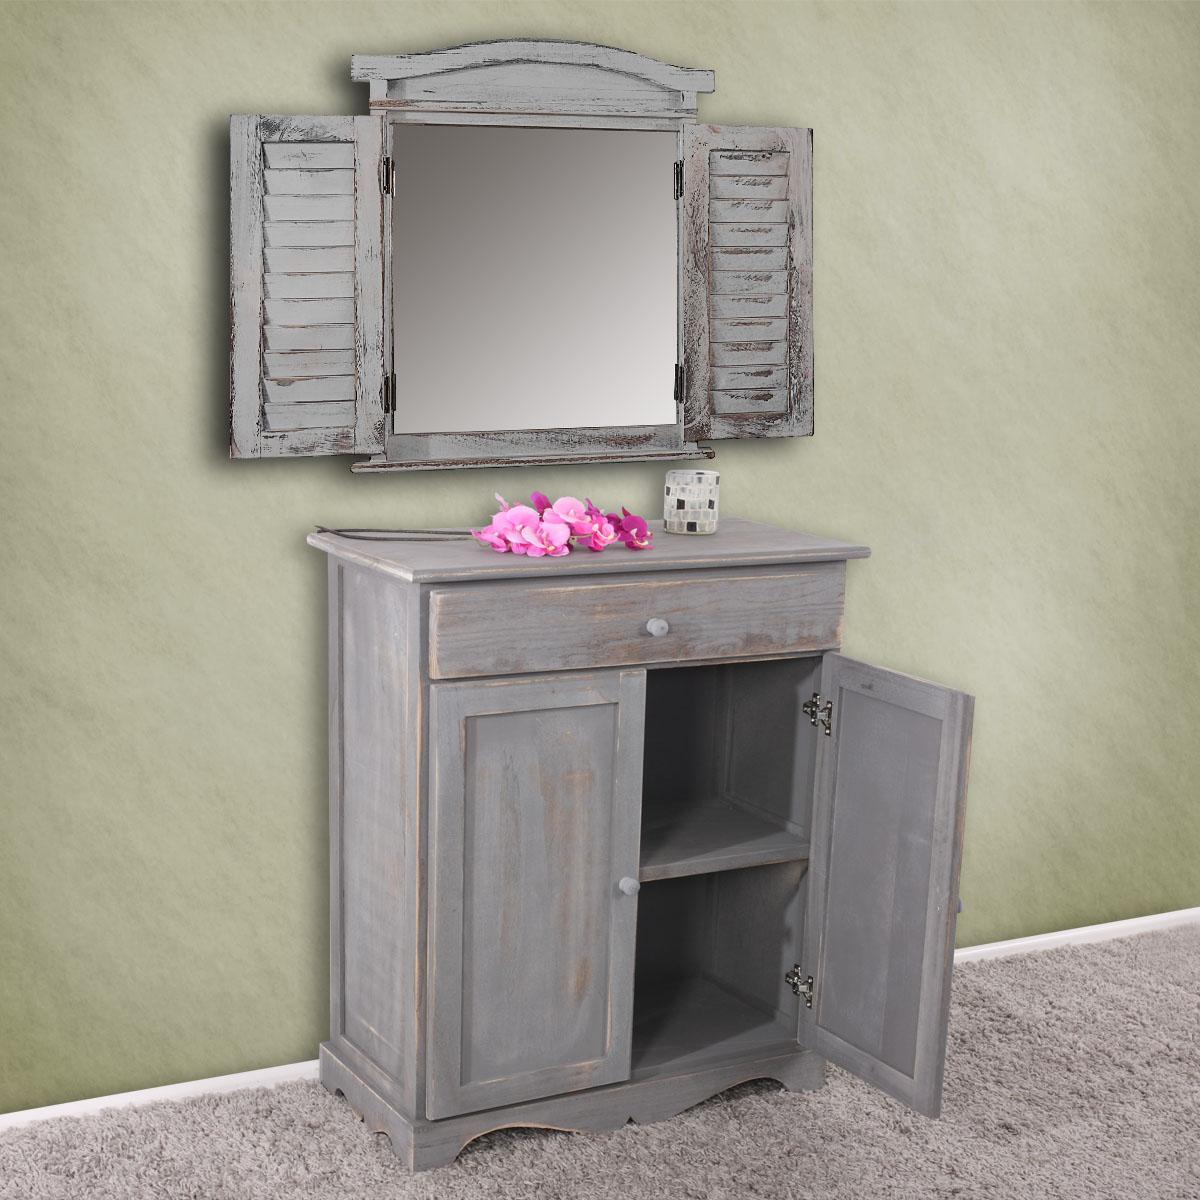 kommode 78x66x33cm shabby look vintage dunkelgrau. Black Bedroom Furniture Sets. Home Design Ideas